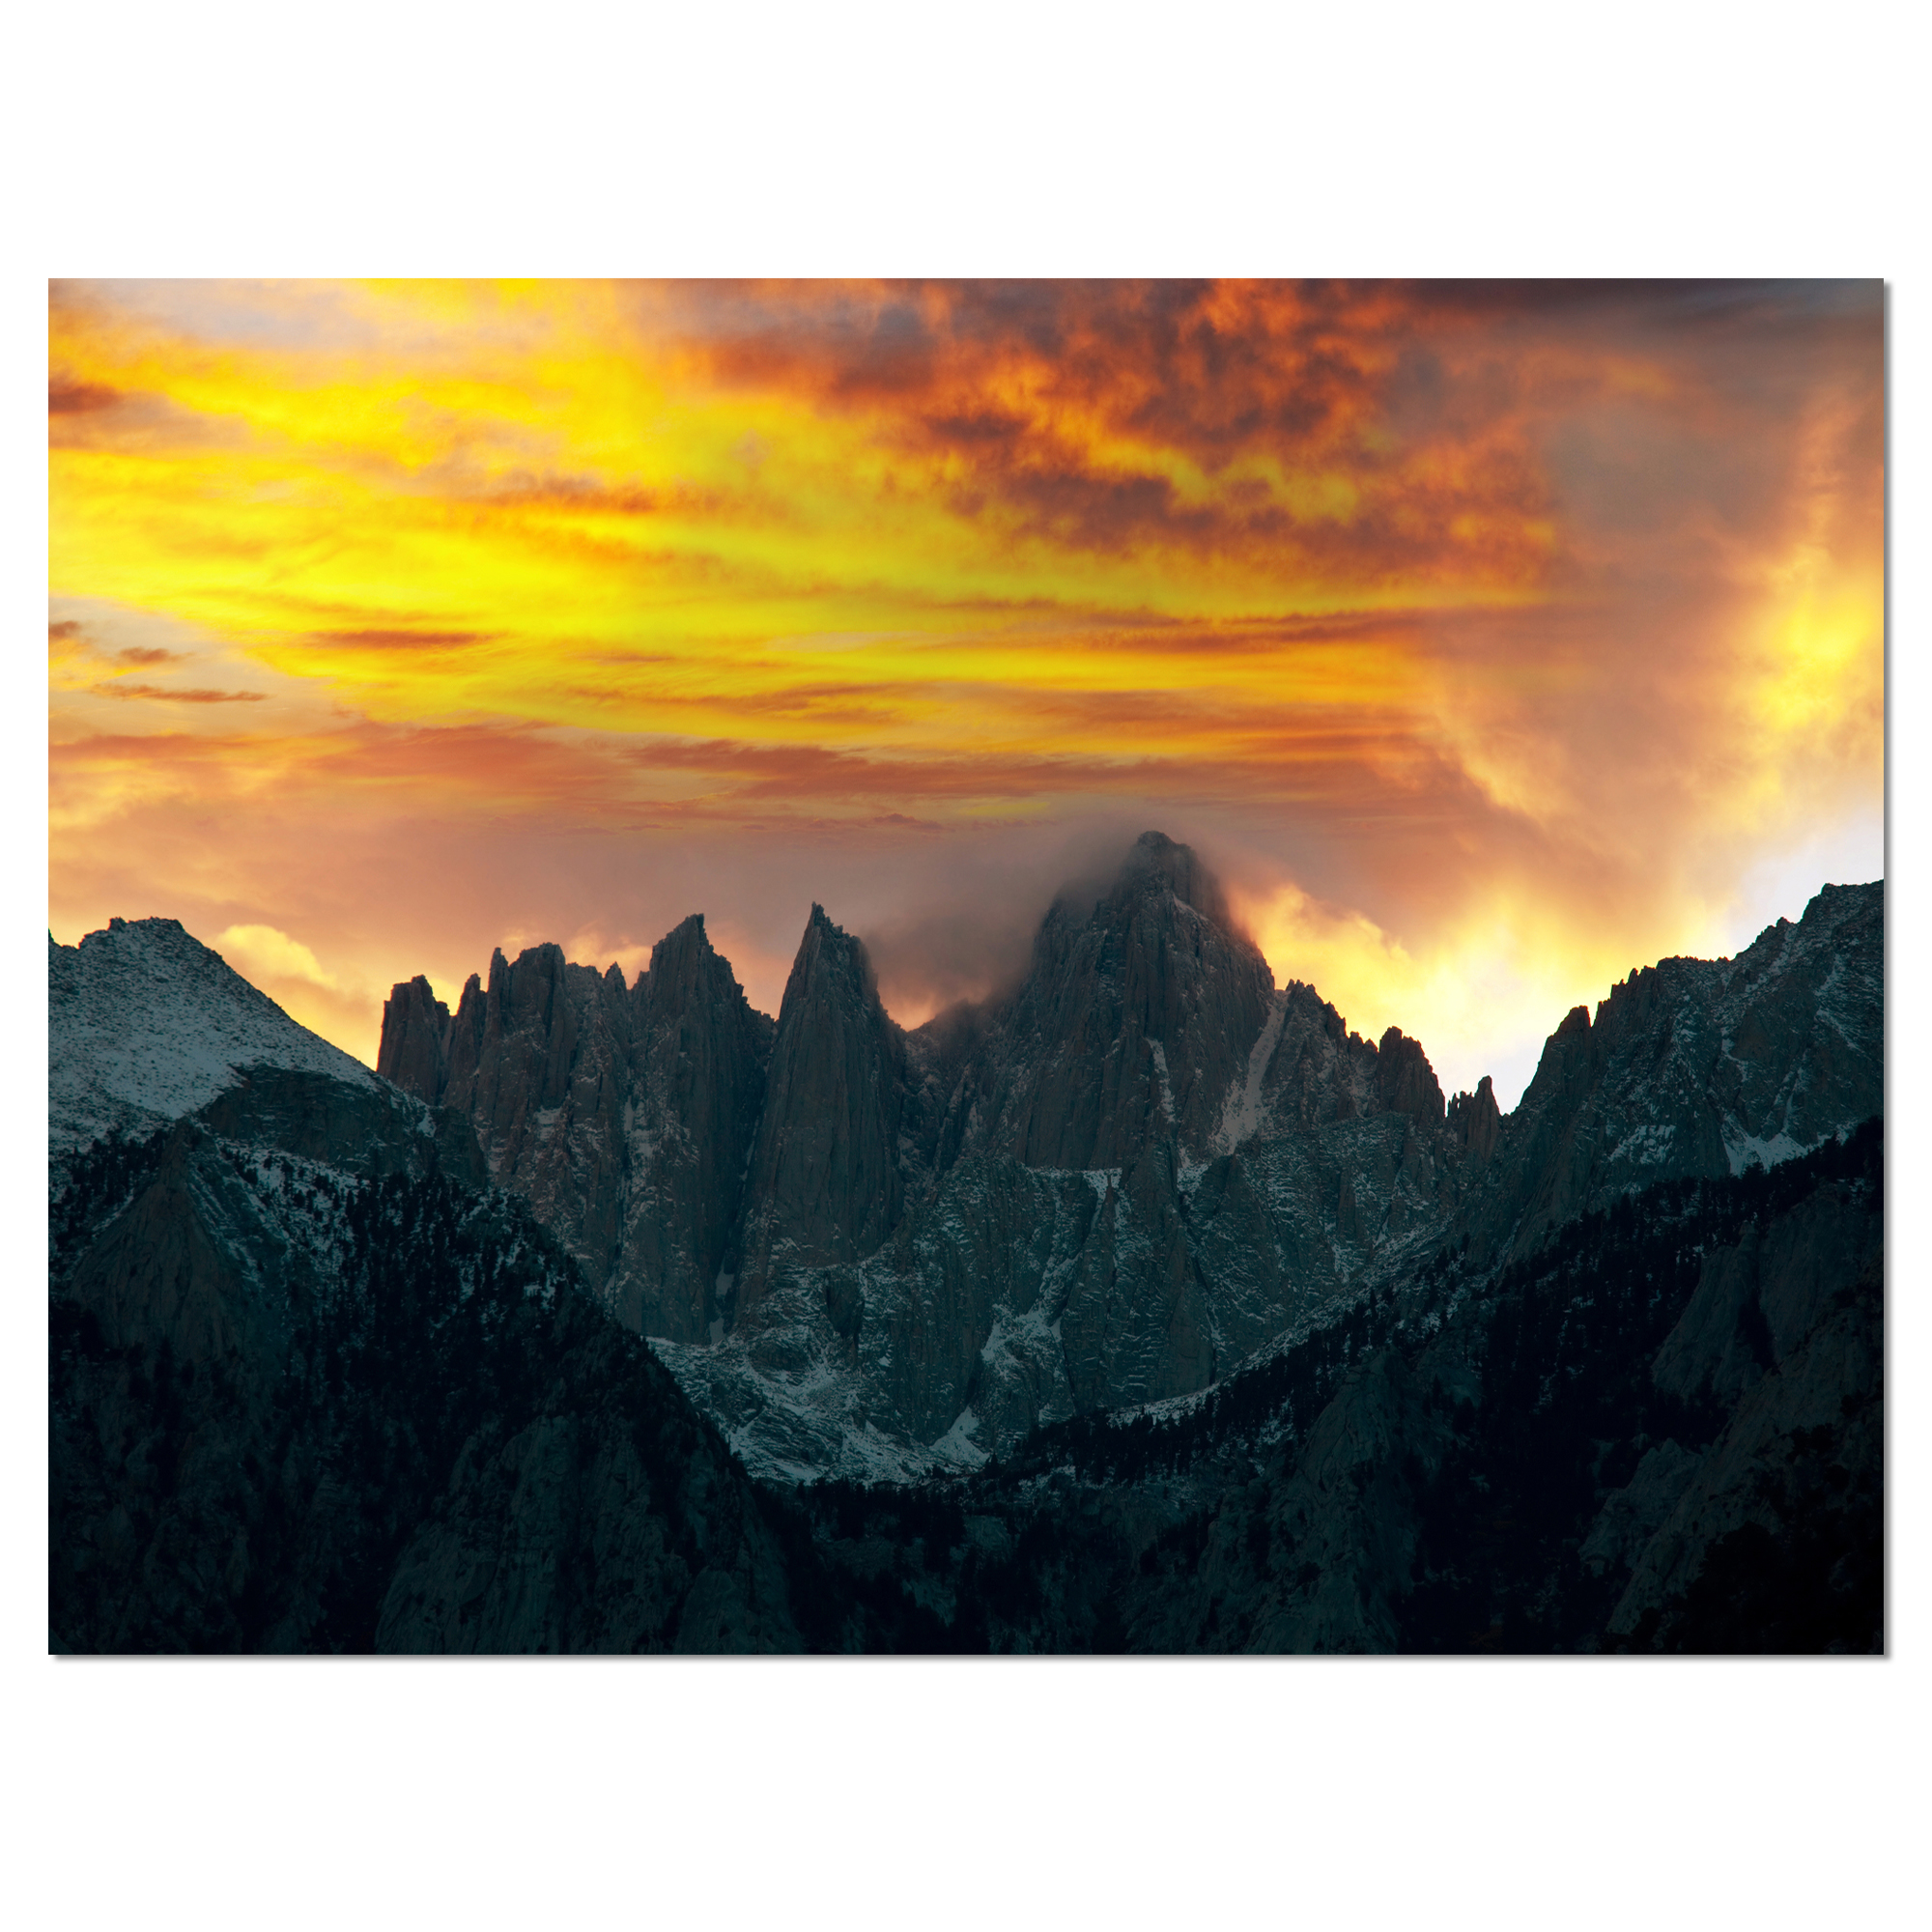 Whitney Mountains under Cloudy Sky - Oversized Landscape Canvas Art - image 2 of 3